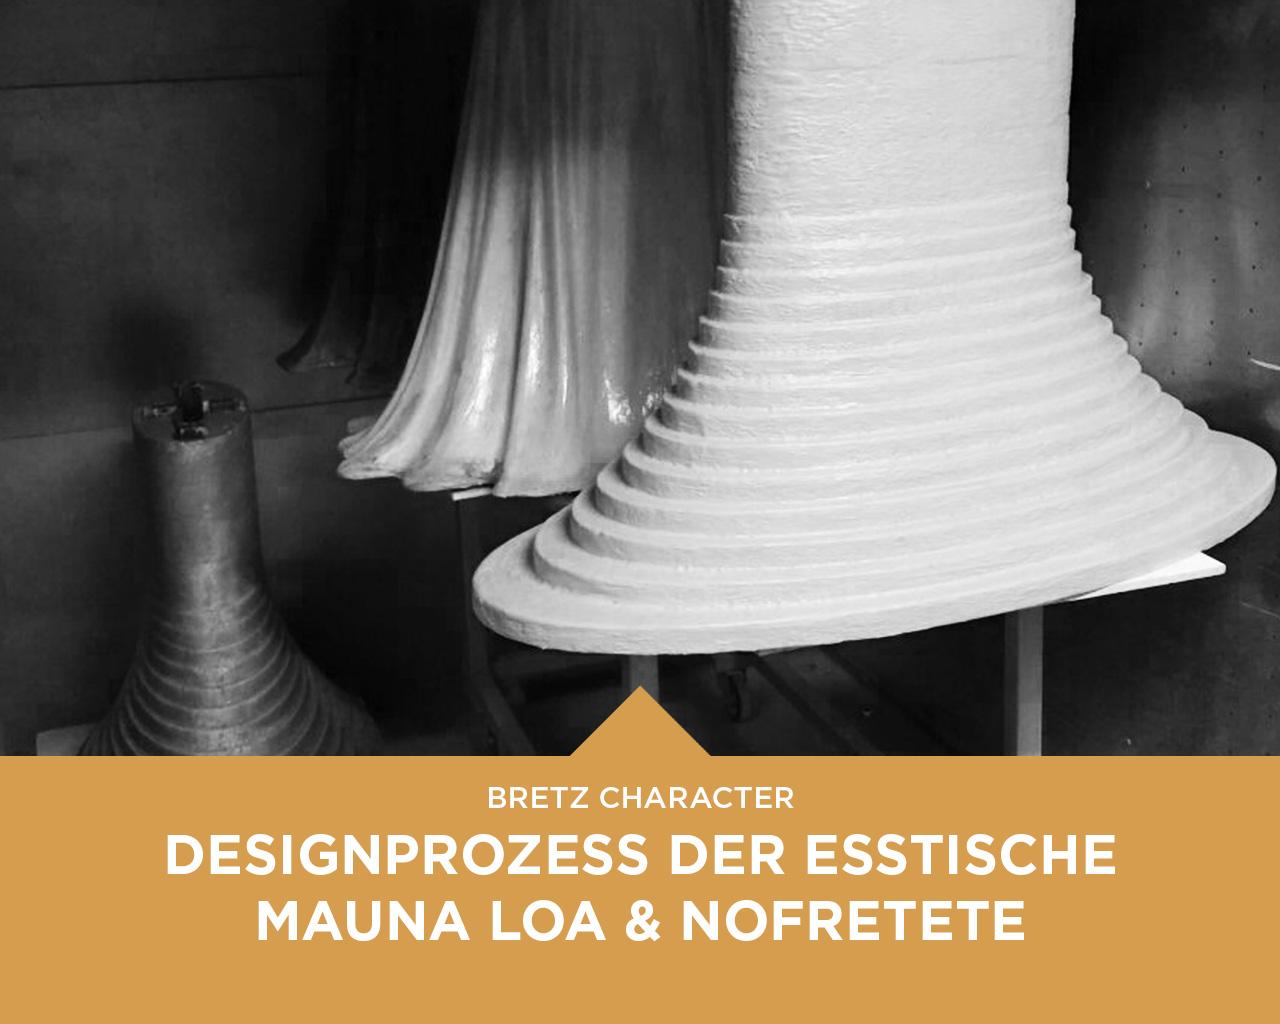 character designprozess der skulpturalen bretz esstische. Black Bedroom Furniture Sets. Home Design Ideas